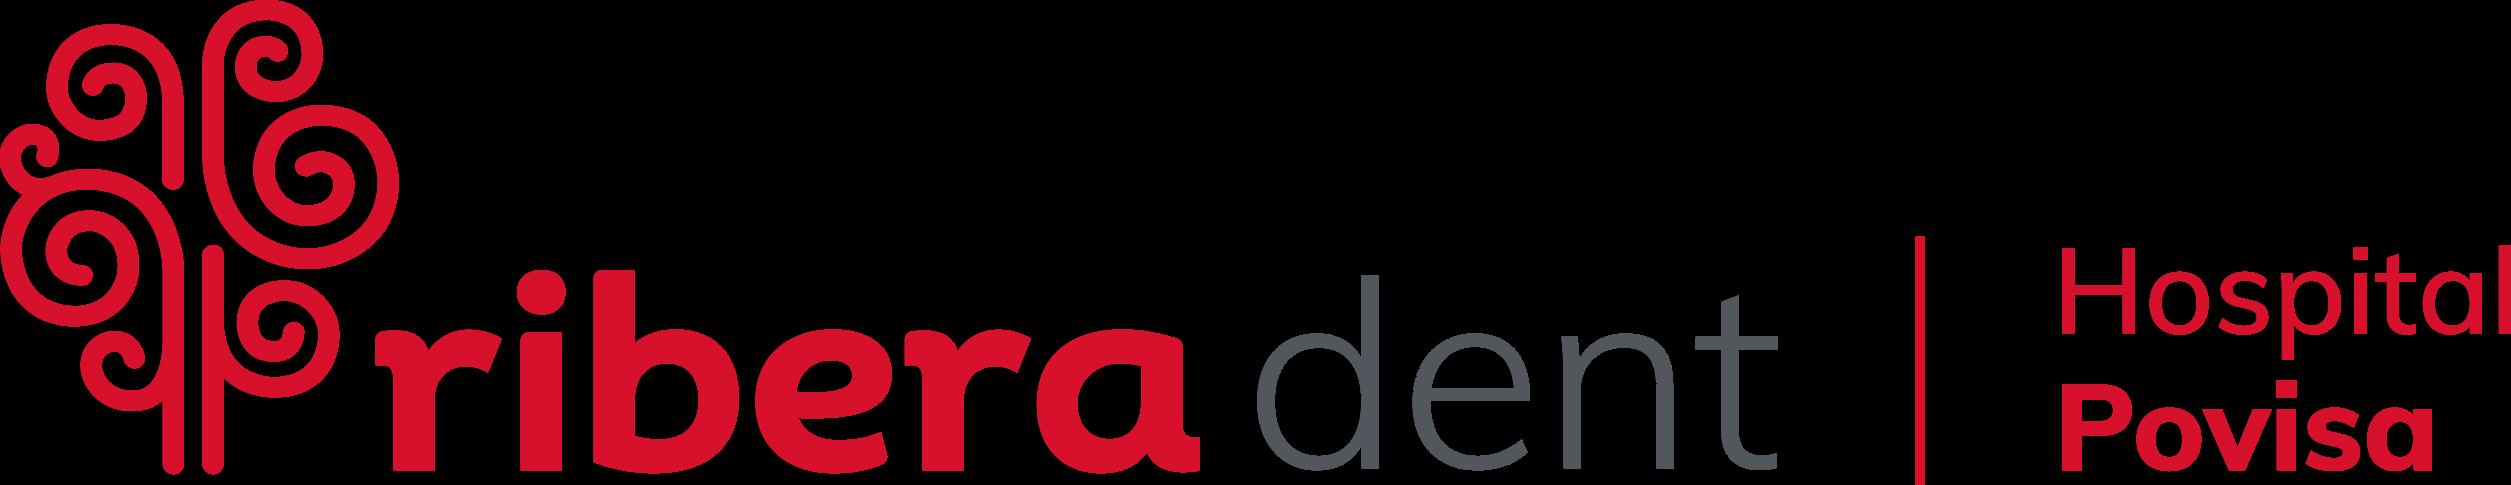 Ribera Dent